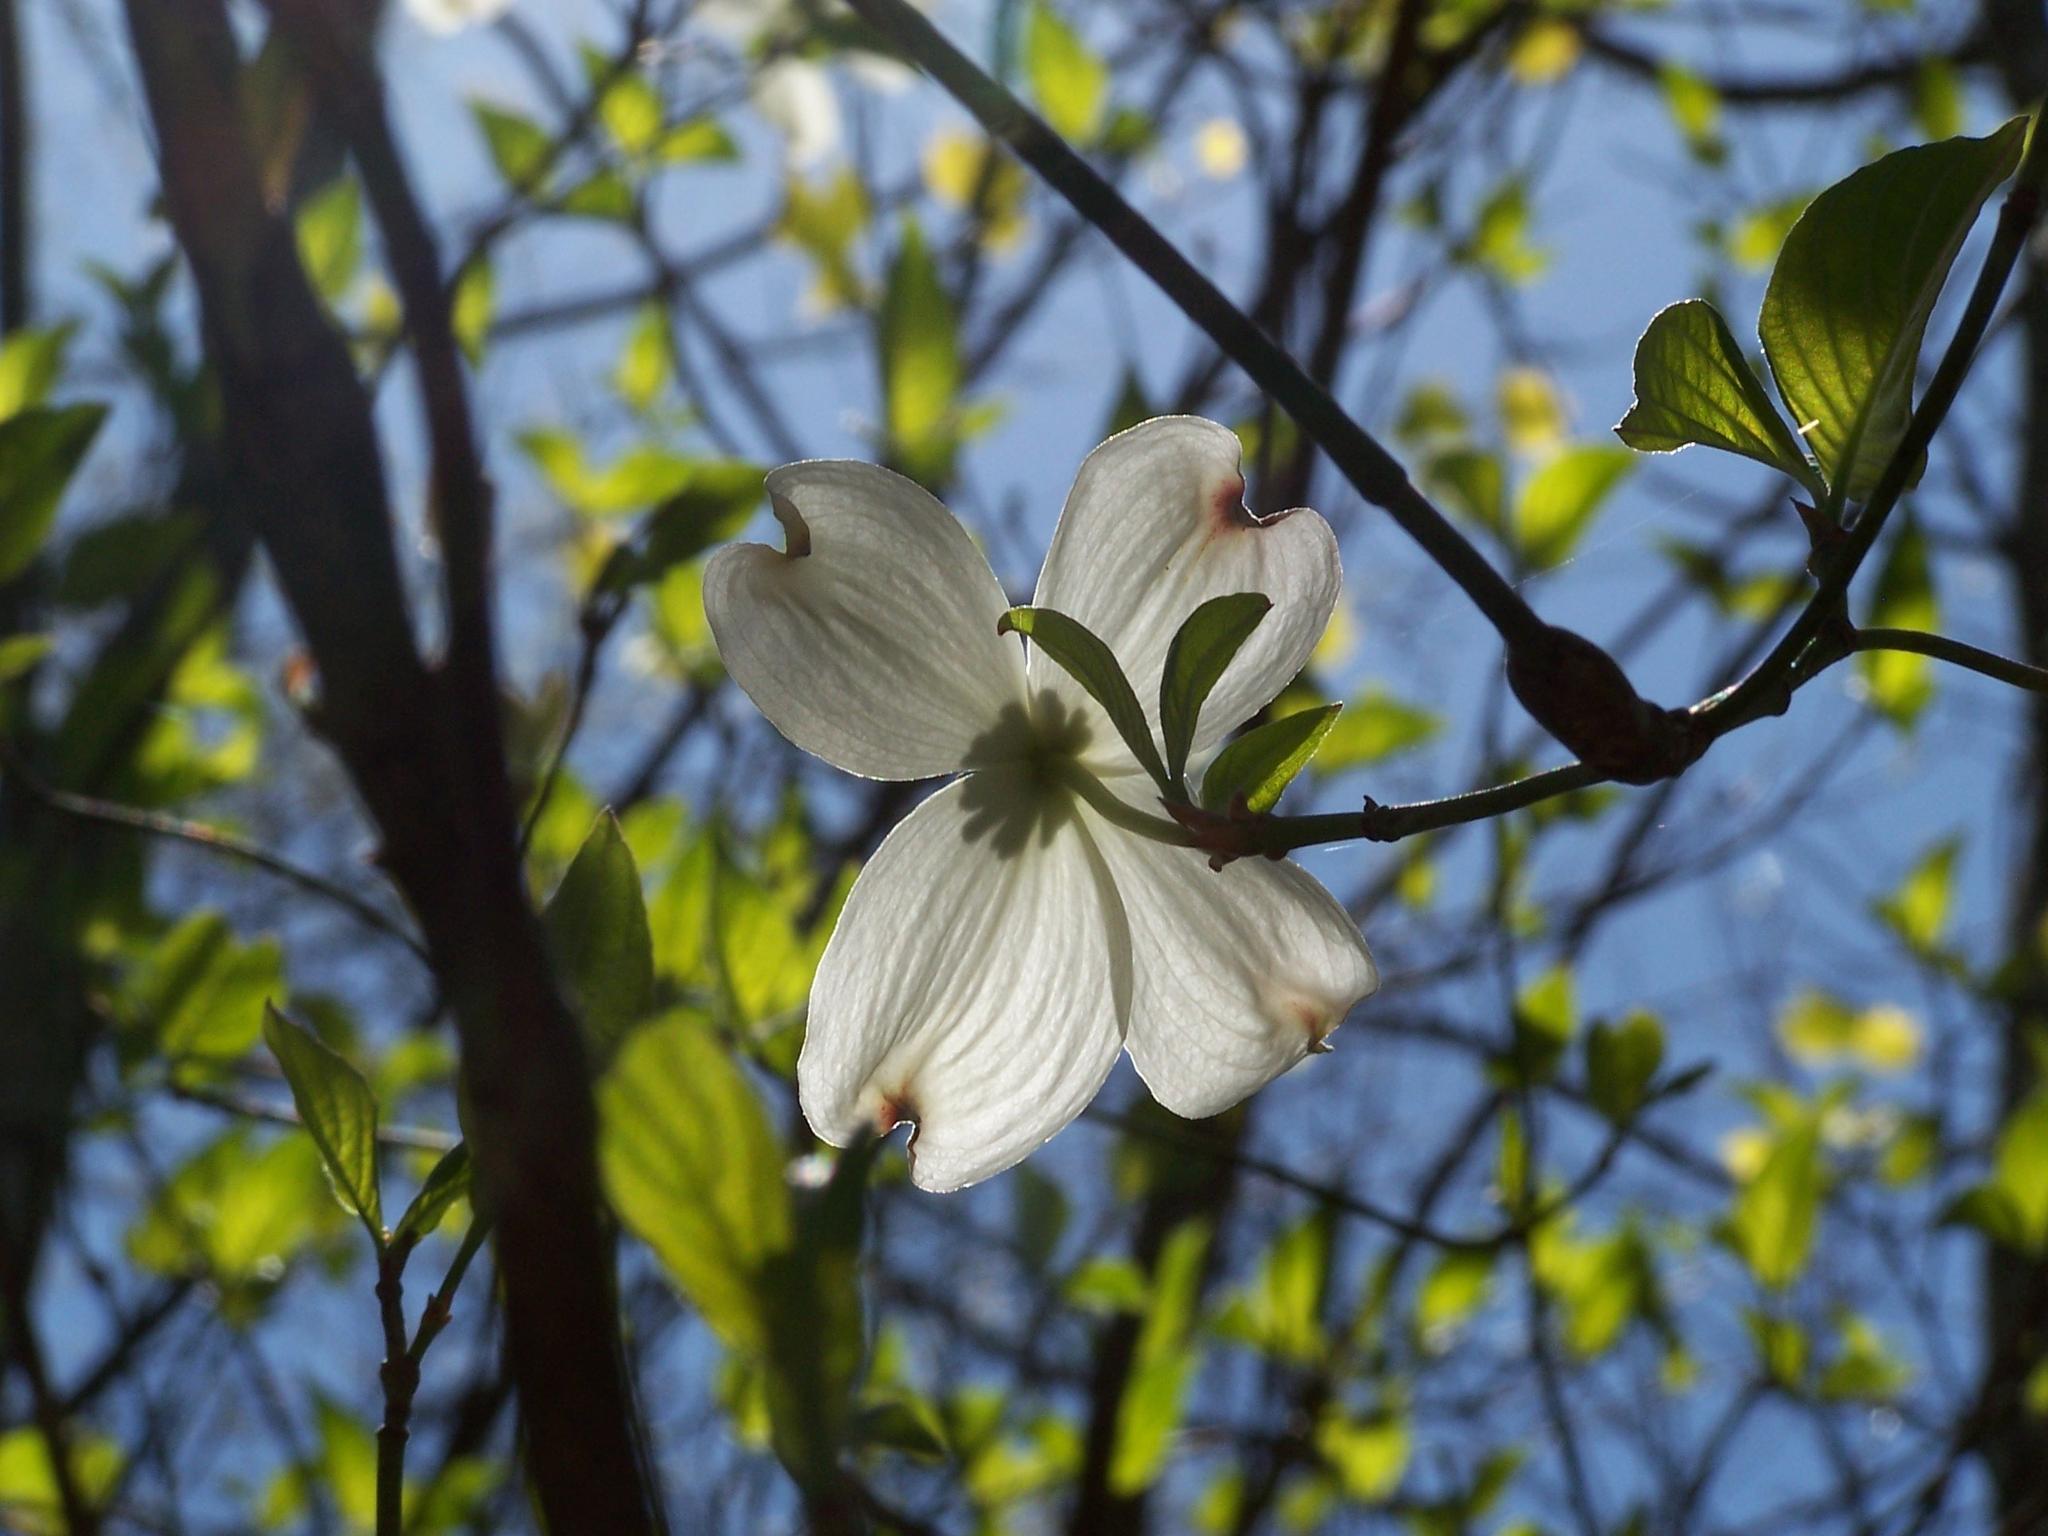 Spring blossom by Susan Swearengin